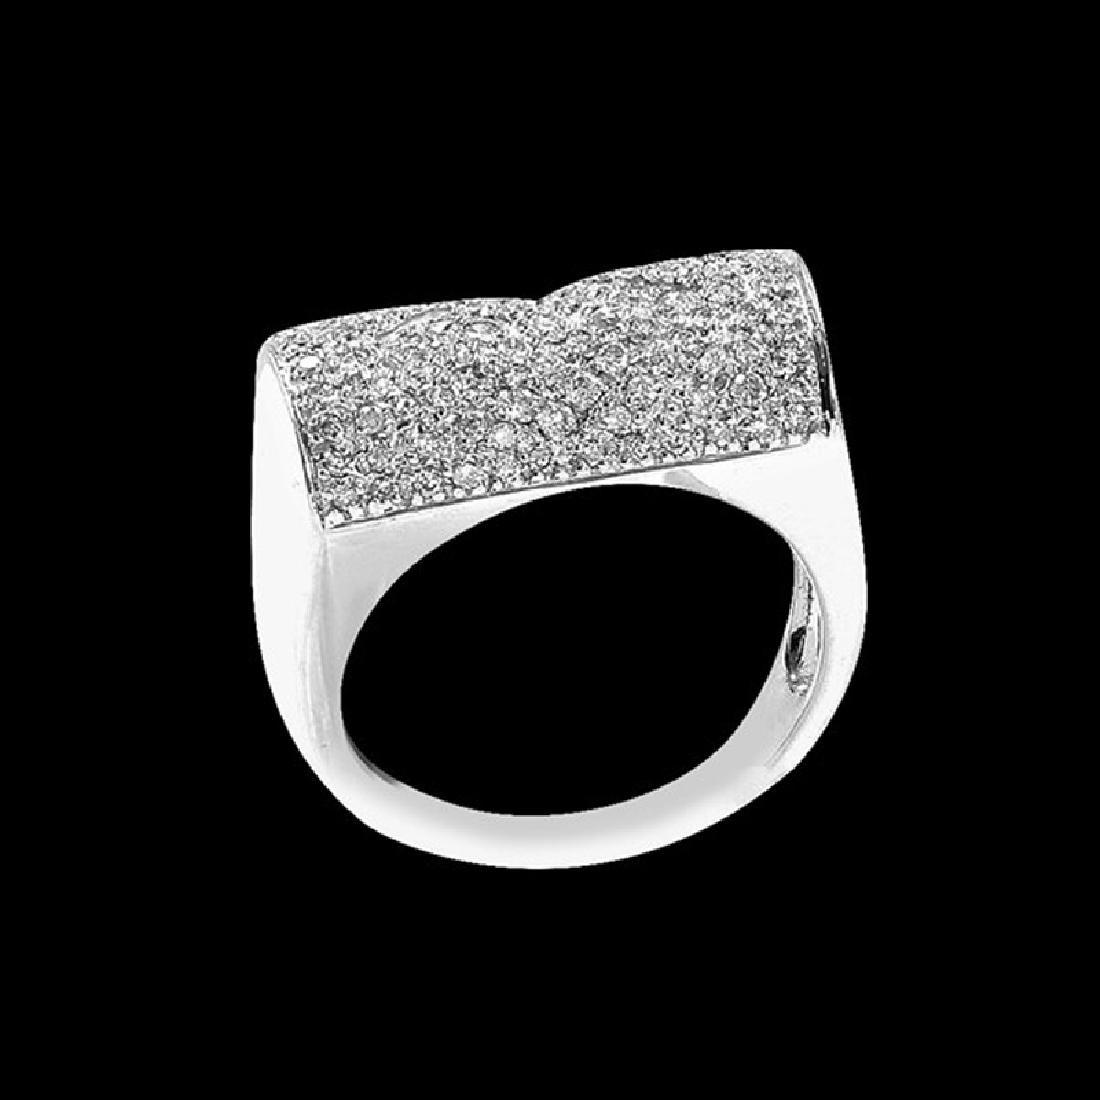 0.85CT NATURAL DIAMOND 14K WHITE GOLD RING